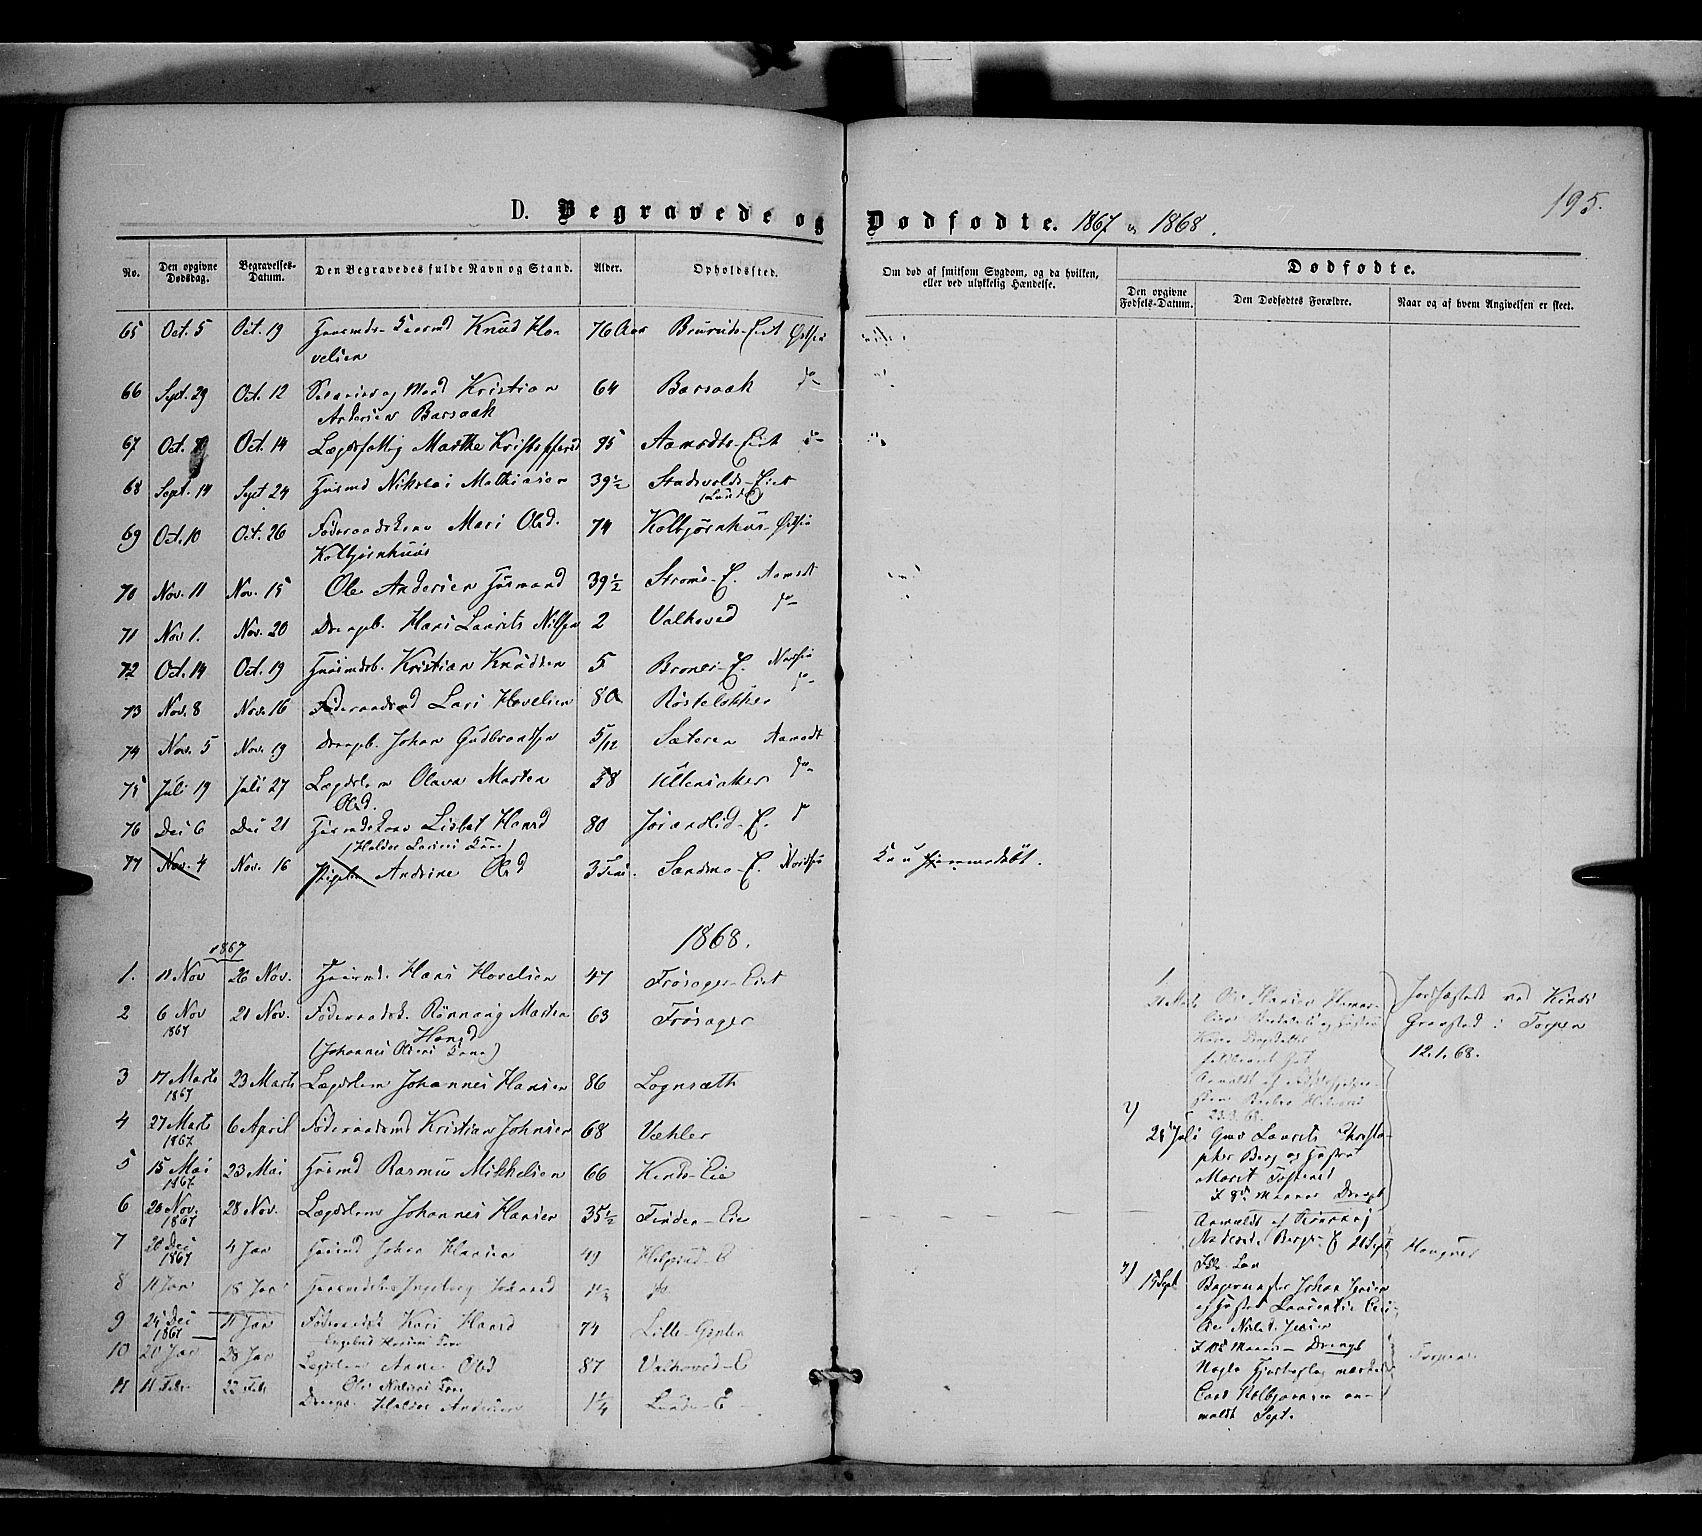 SAH, Nordre Land prestekontor, Ministerialbok nr. 1, 1860-1871, s. 195